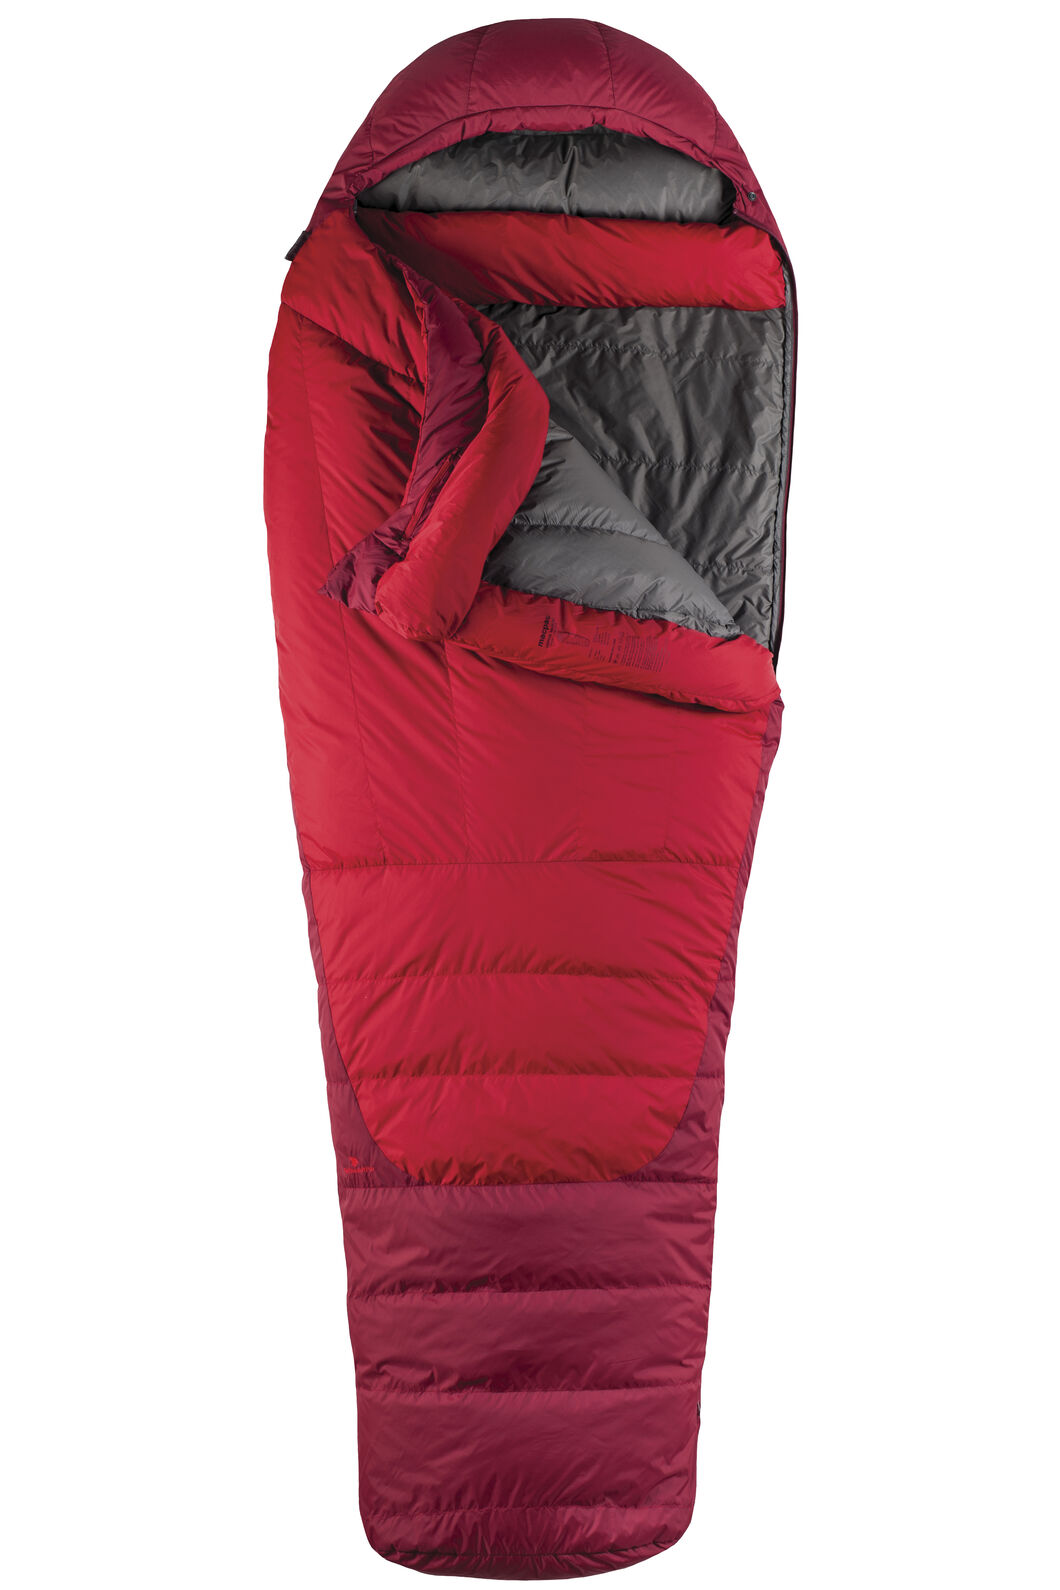 Macpac Latitude XP Goose Down 500 Sleeping Bag - Extra Large, Chilli, hi-res